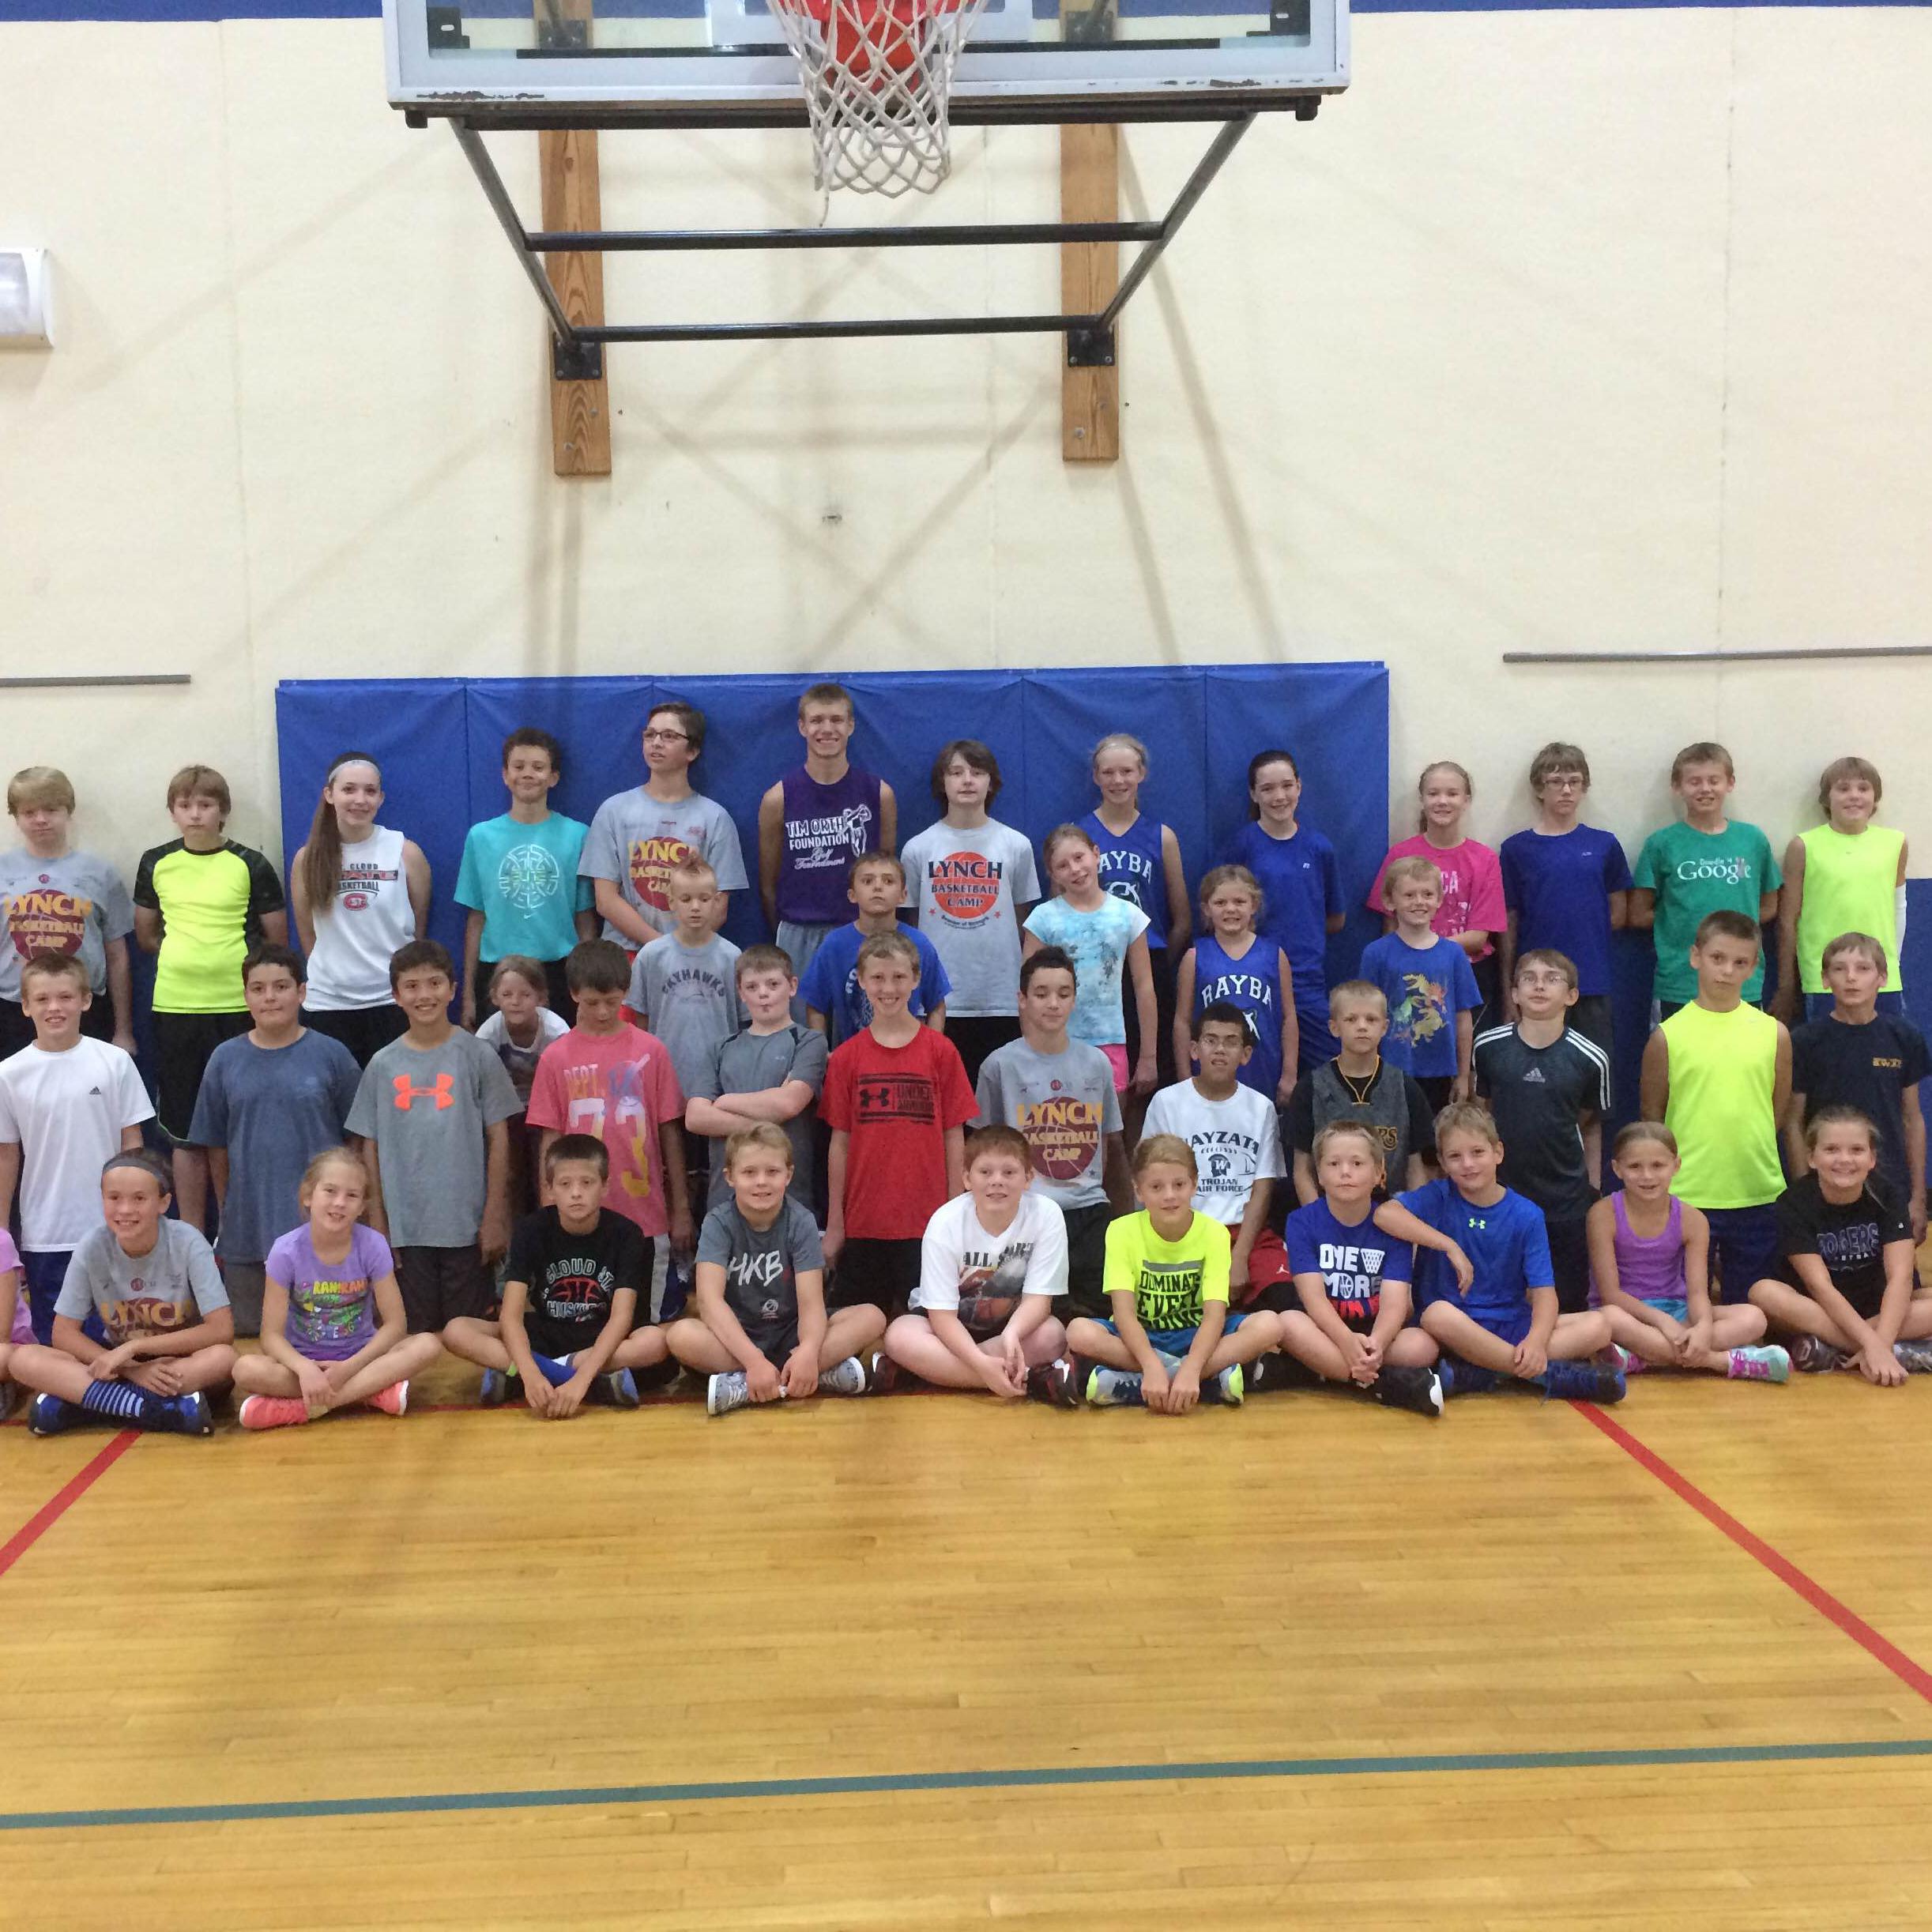 Lynch Basketball Camp | age 8-14